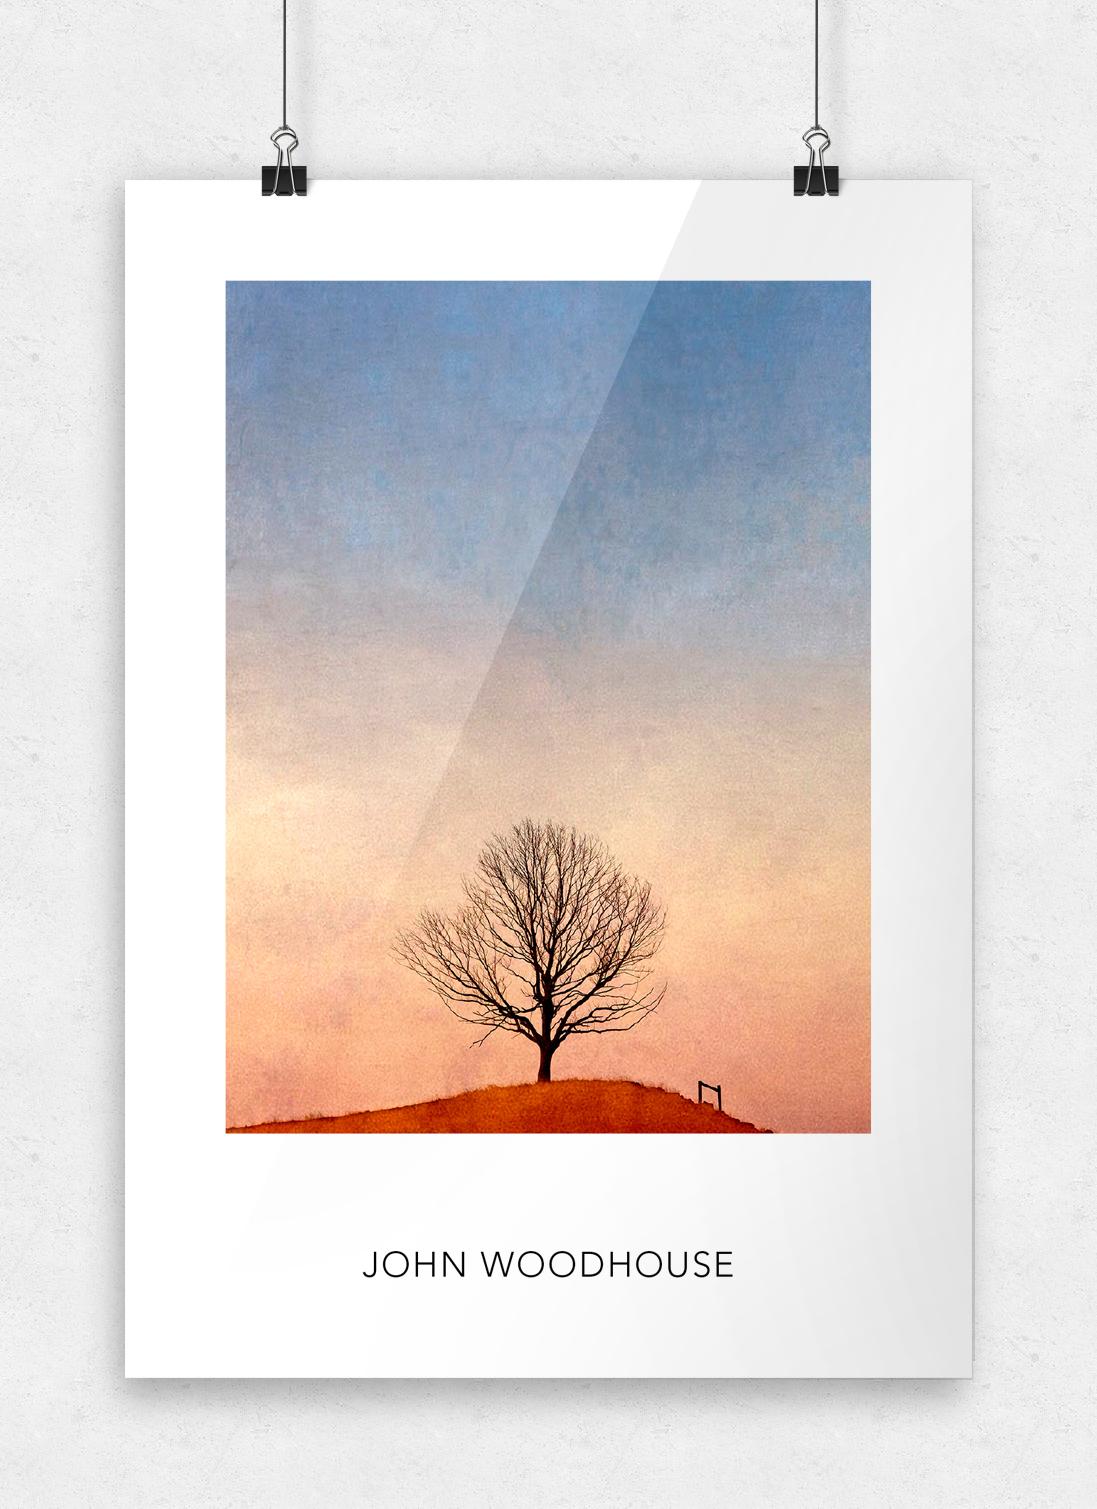 JW-Posters-Template_01.jpg